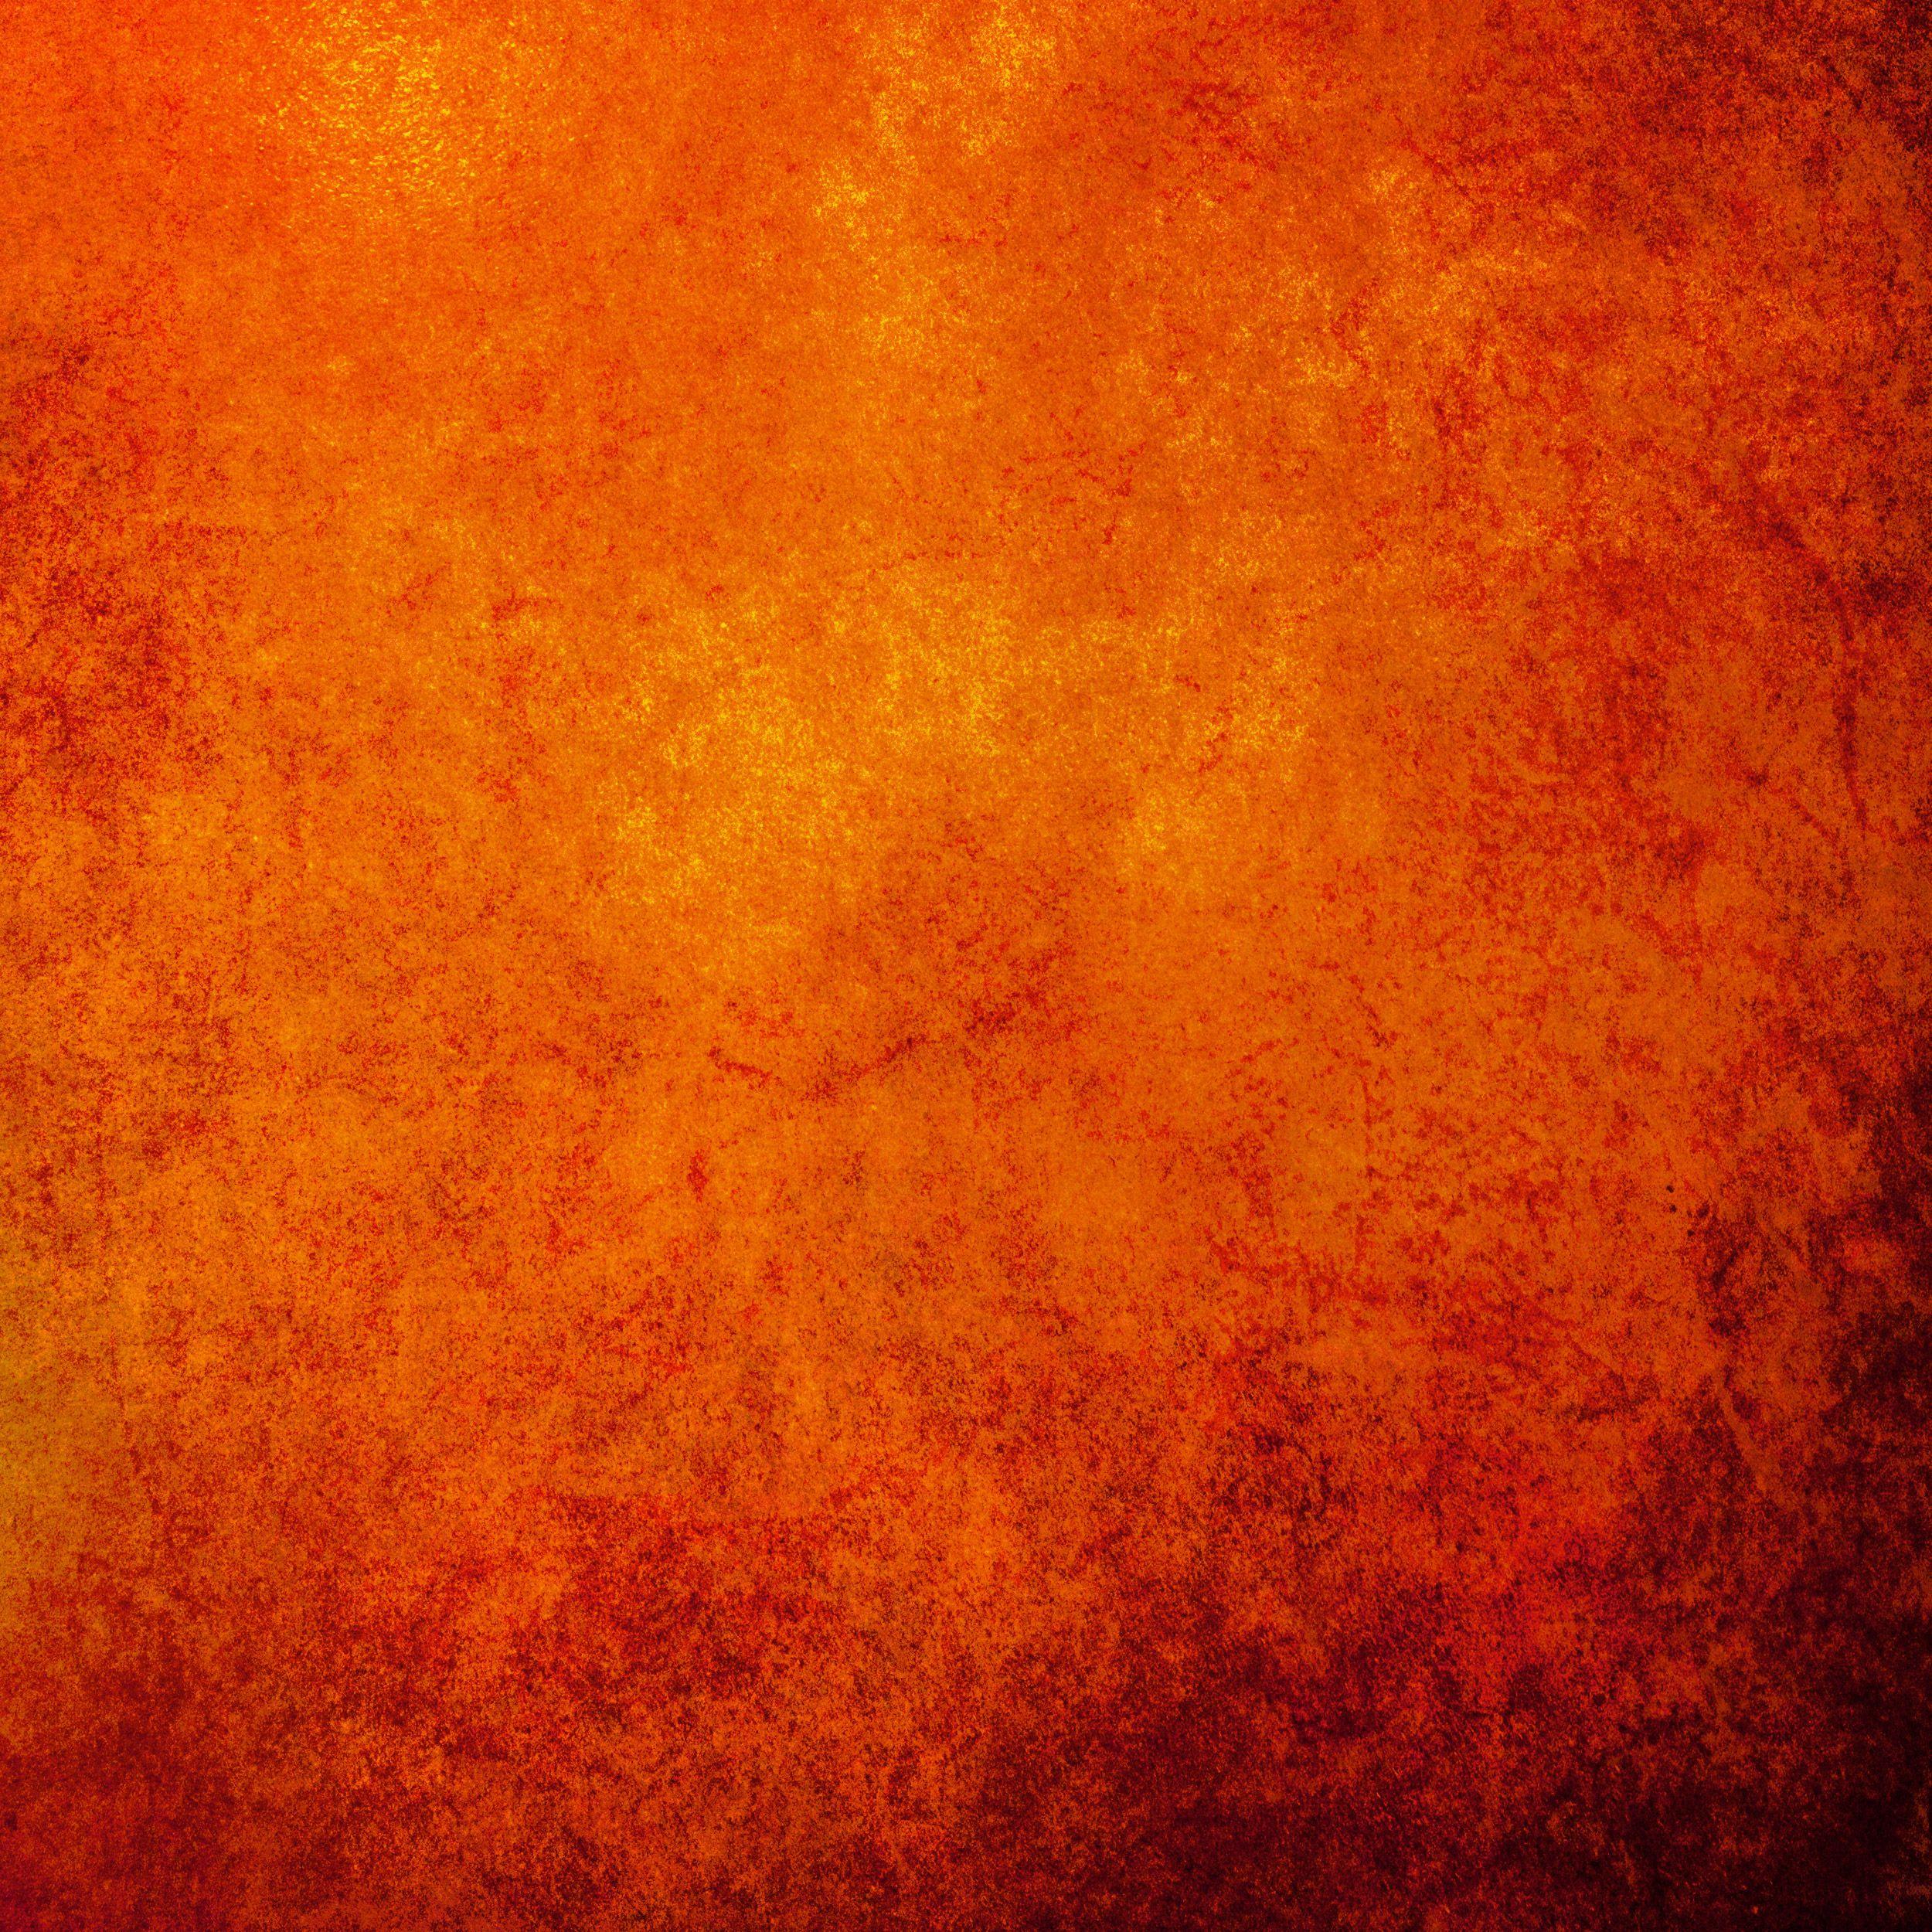 orange textures - Google Search | textures | Gold textured ...